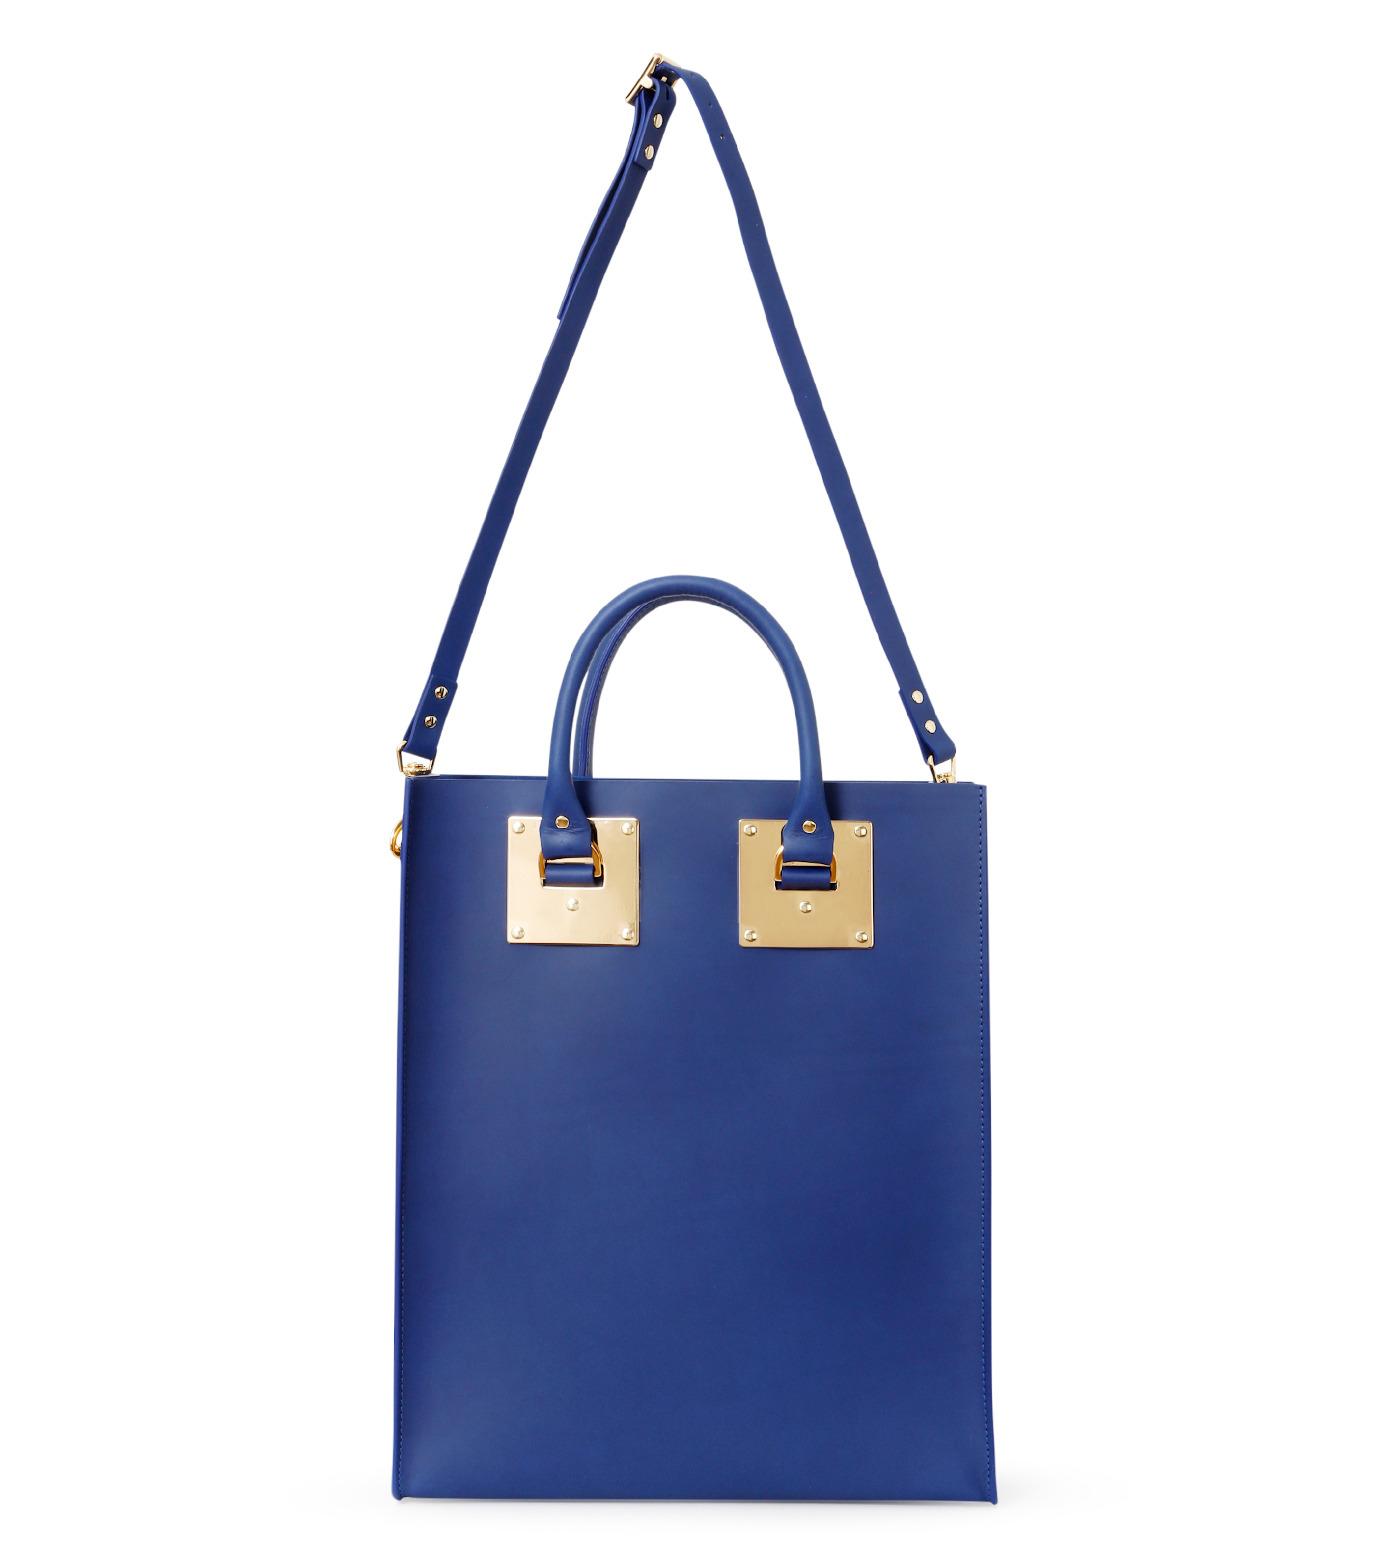 Sophie Hulme(ソフィーヒュルム)のLarge Tote Bag-BLUE(バッグ/bag)-BG047LE-L-92 拡大詳細画像2